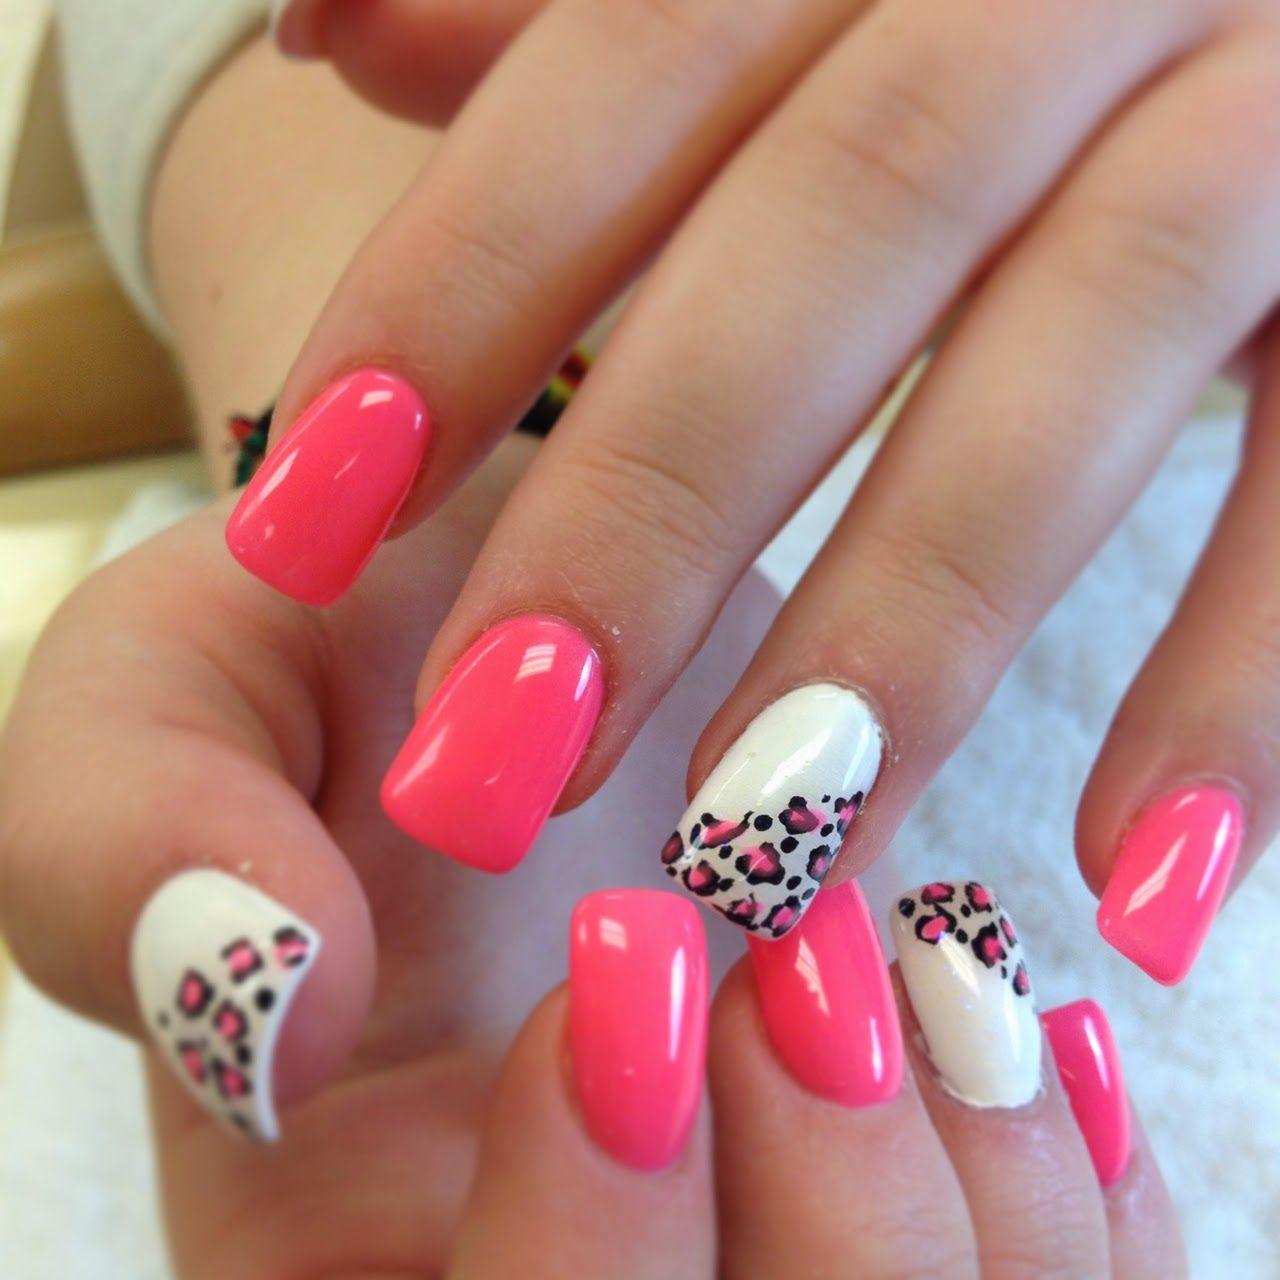 DIY acrylic nails | Nails | Pinterest | Diy acrylic nails, Acrylics ...